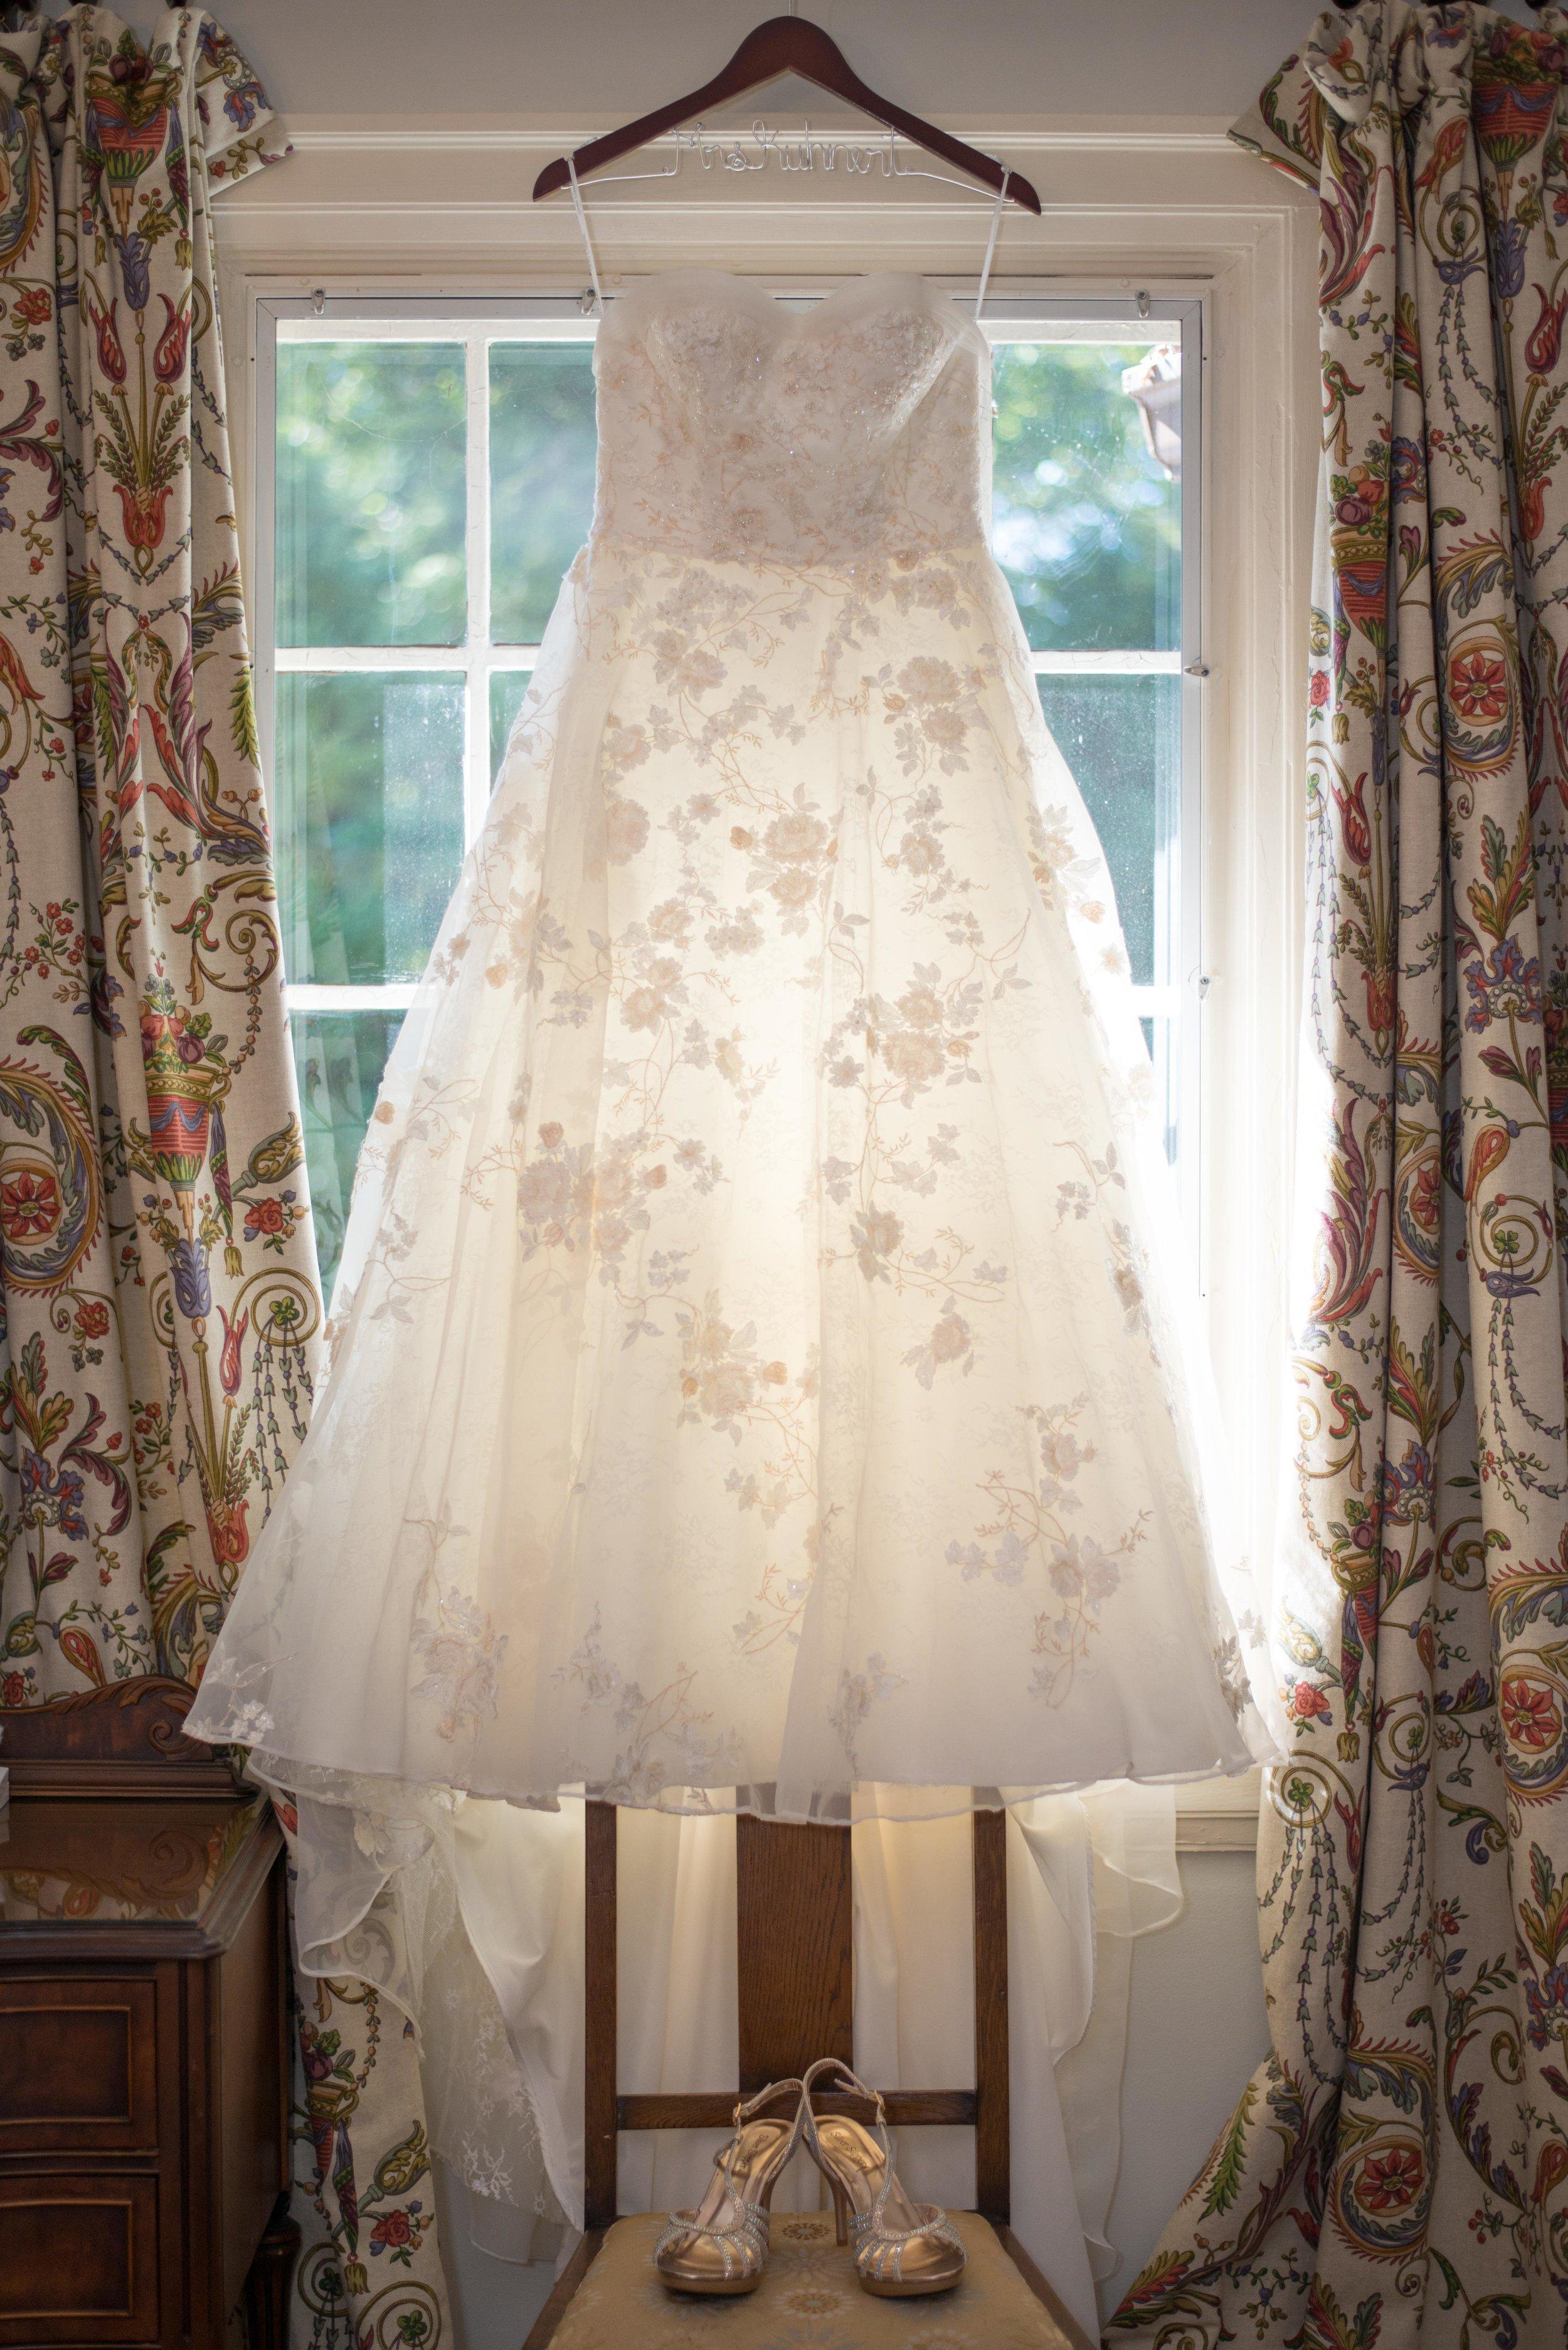 00001_Kuhnert-Wedding-1.jpg